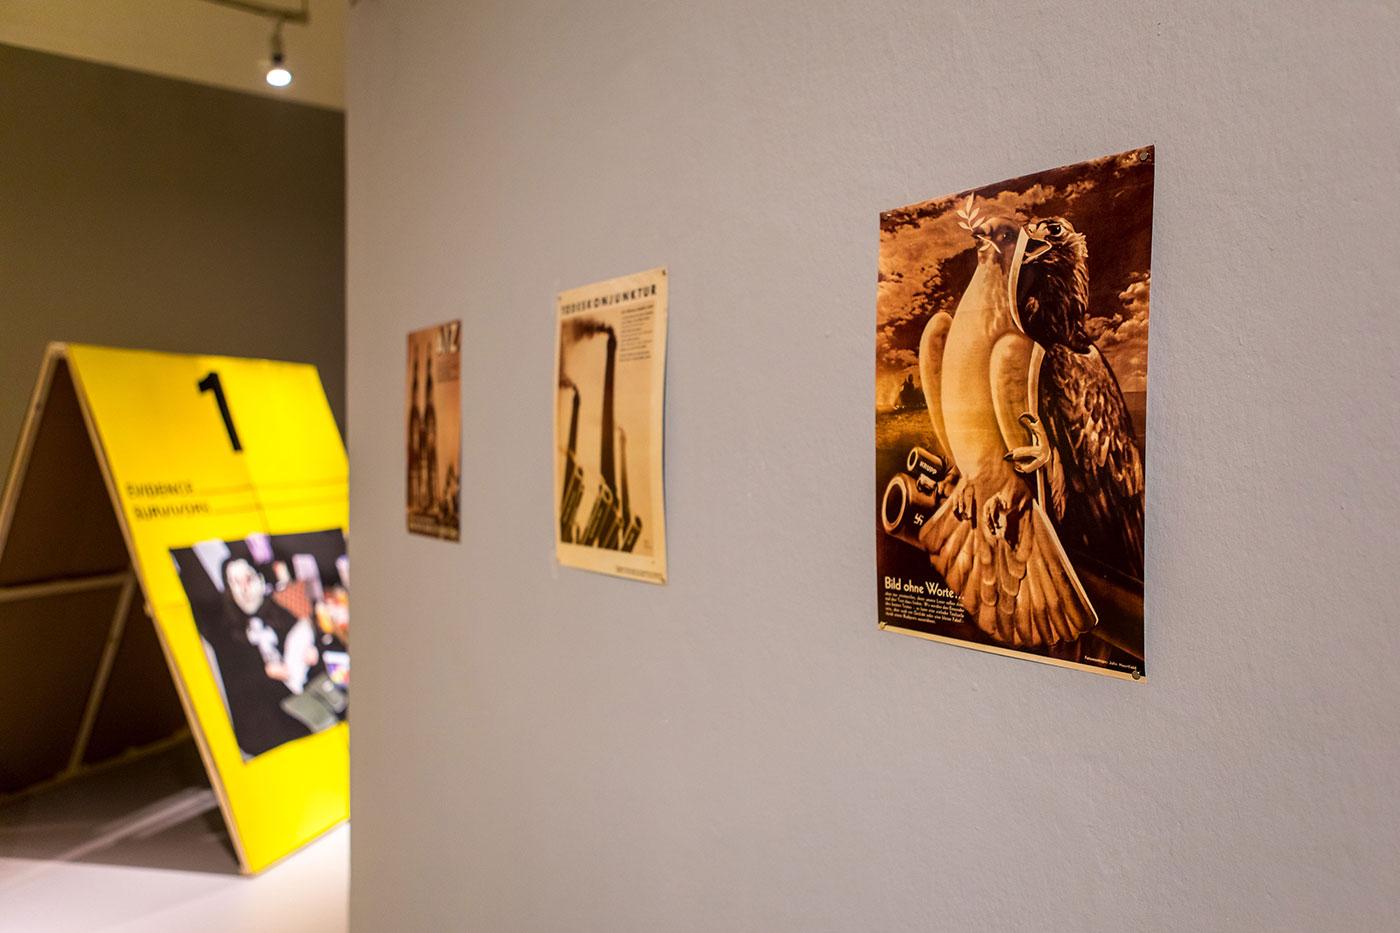 Ausstellungsansicht »Up in Arms«, Kunstraum Kreuzberg/Bethanien 2019, Photo: Julian van Dieken